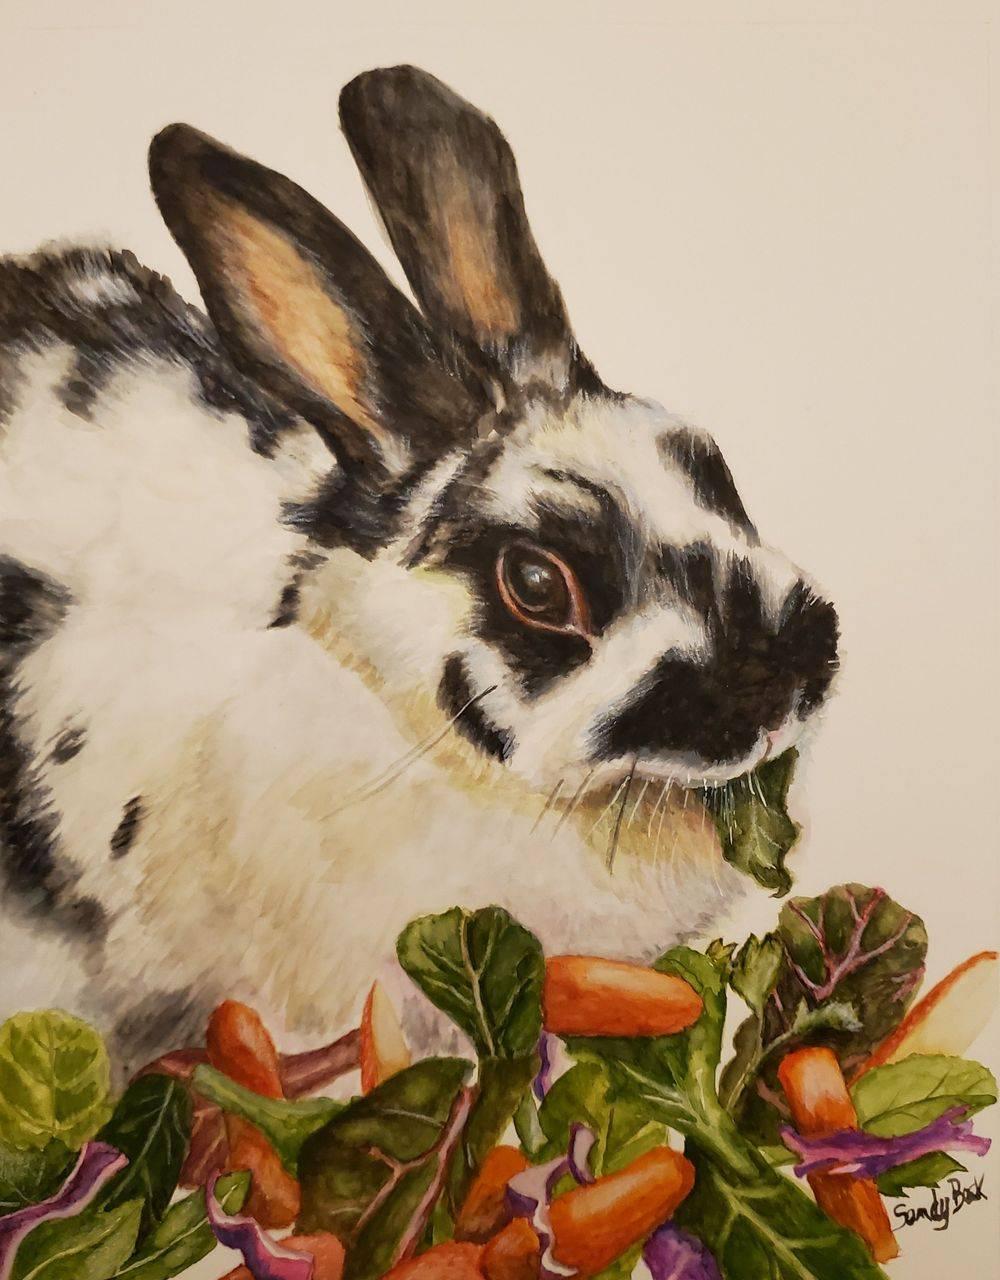 sandy bock, pet portrait artist, pet portraits, rabbit, bunny, custom portrait artist